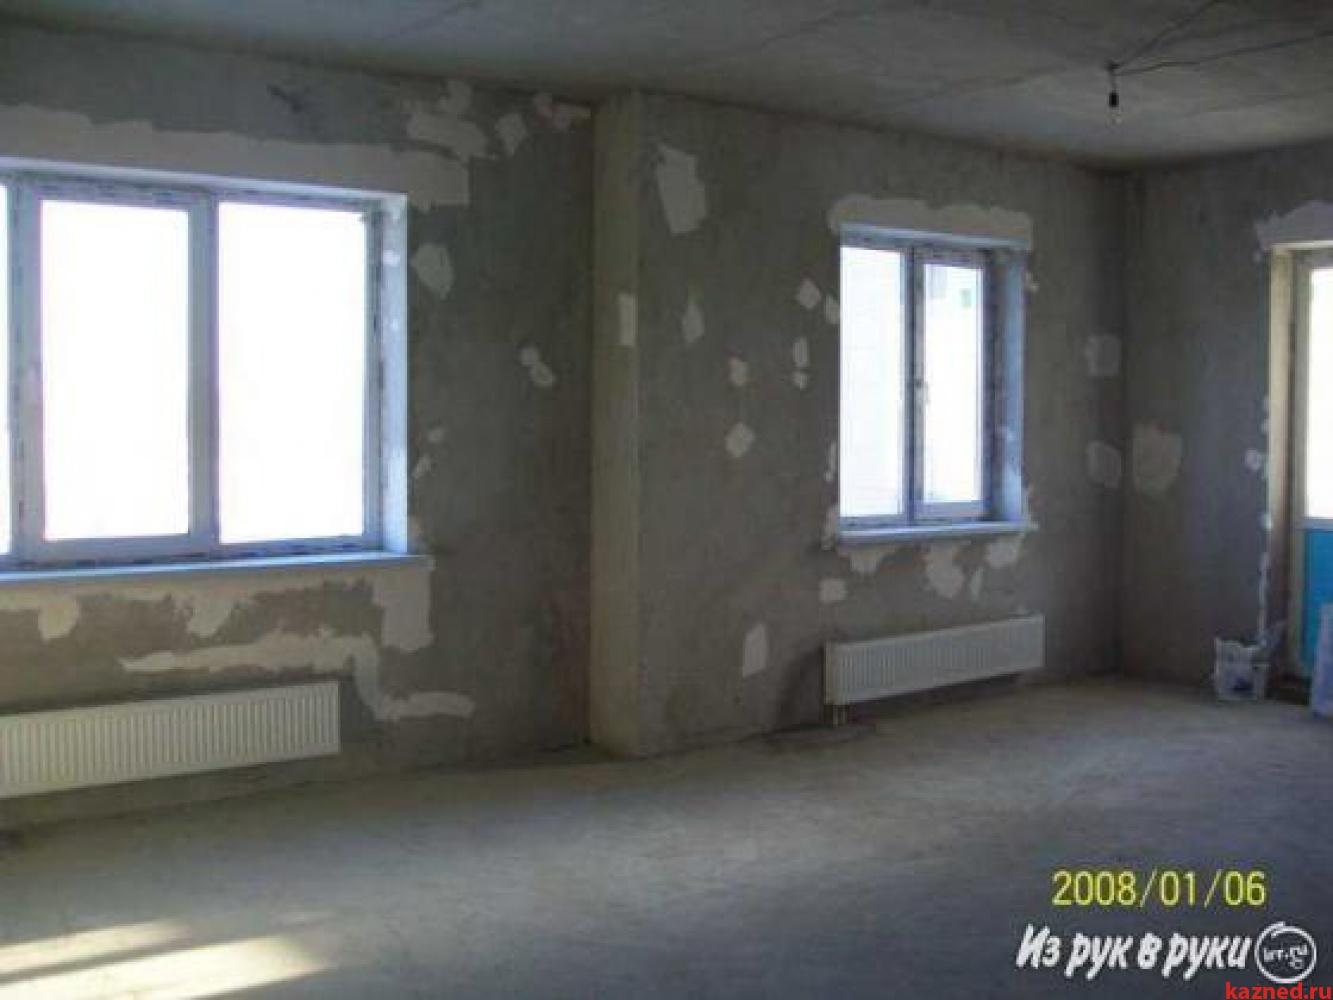 Продажа 1-к квартиры Павлюхина, д.112, 0 м²  (миниатюра №2)